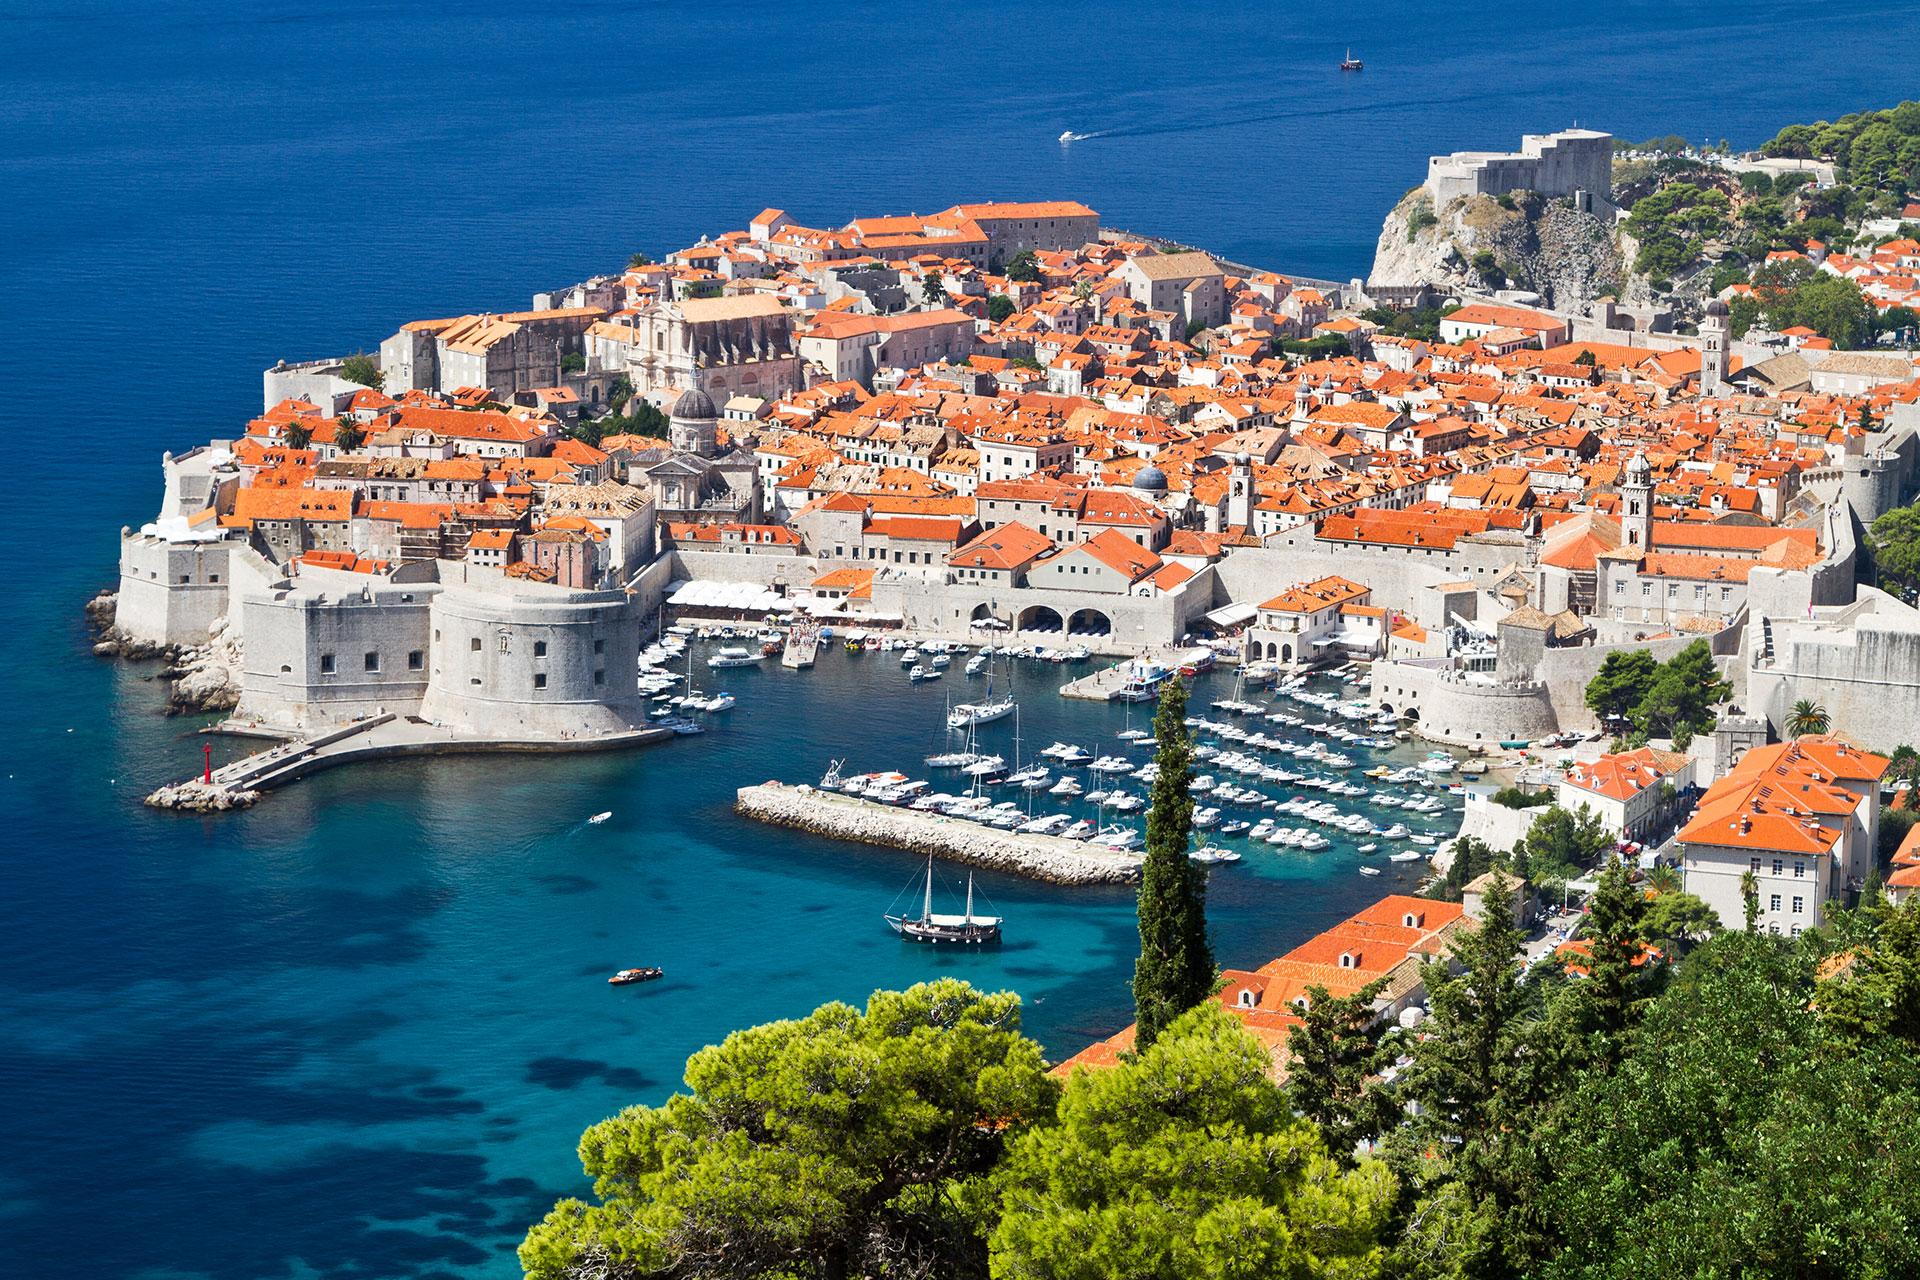 Sailing Holiday Dubrovnik | Family Sailing Holidays | Yacht Charter Croatia | Sabastus Sailing